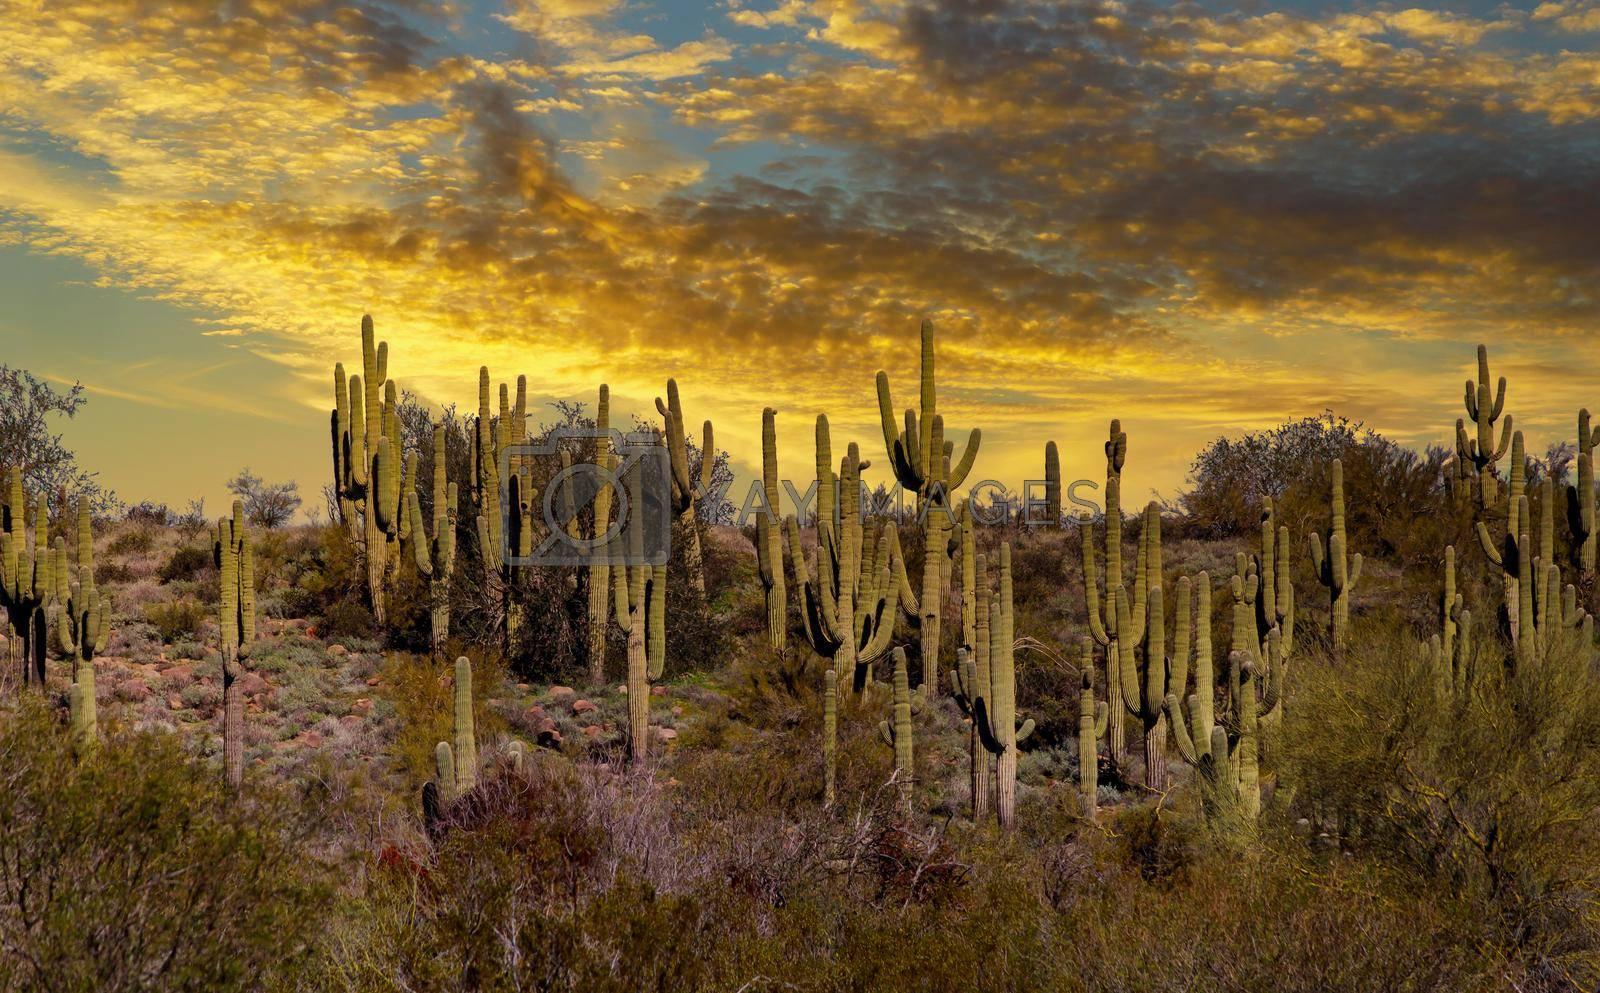 Late light illuminates sunset at near Tucson Arizona with desert of cactus